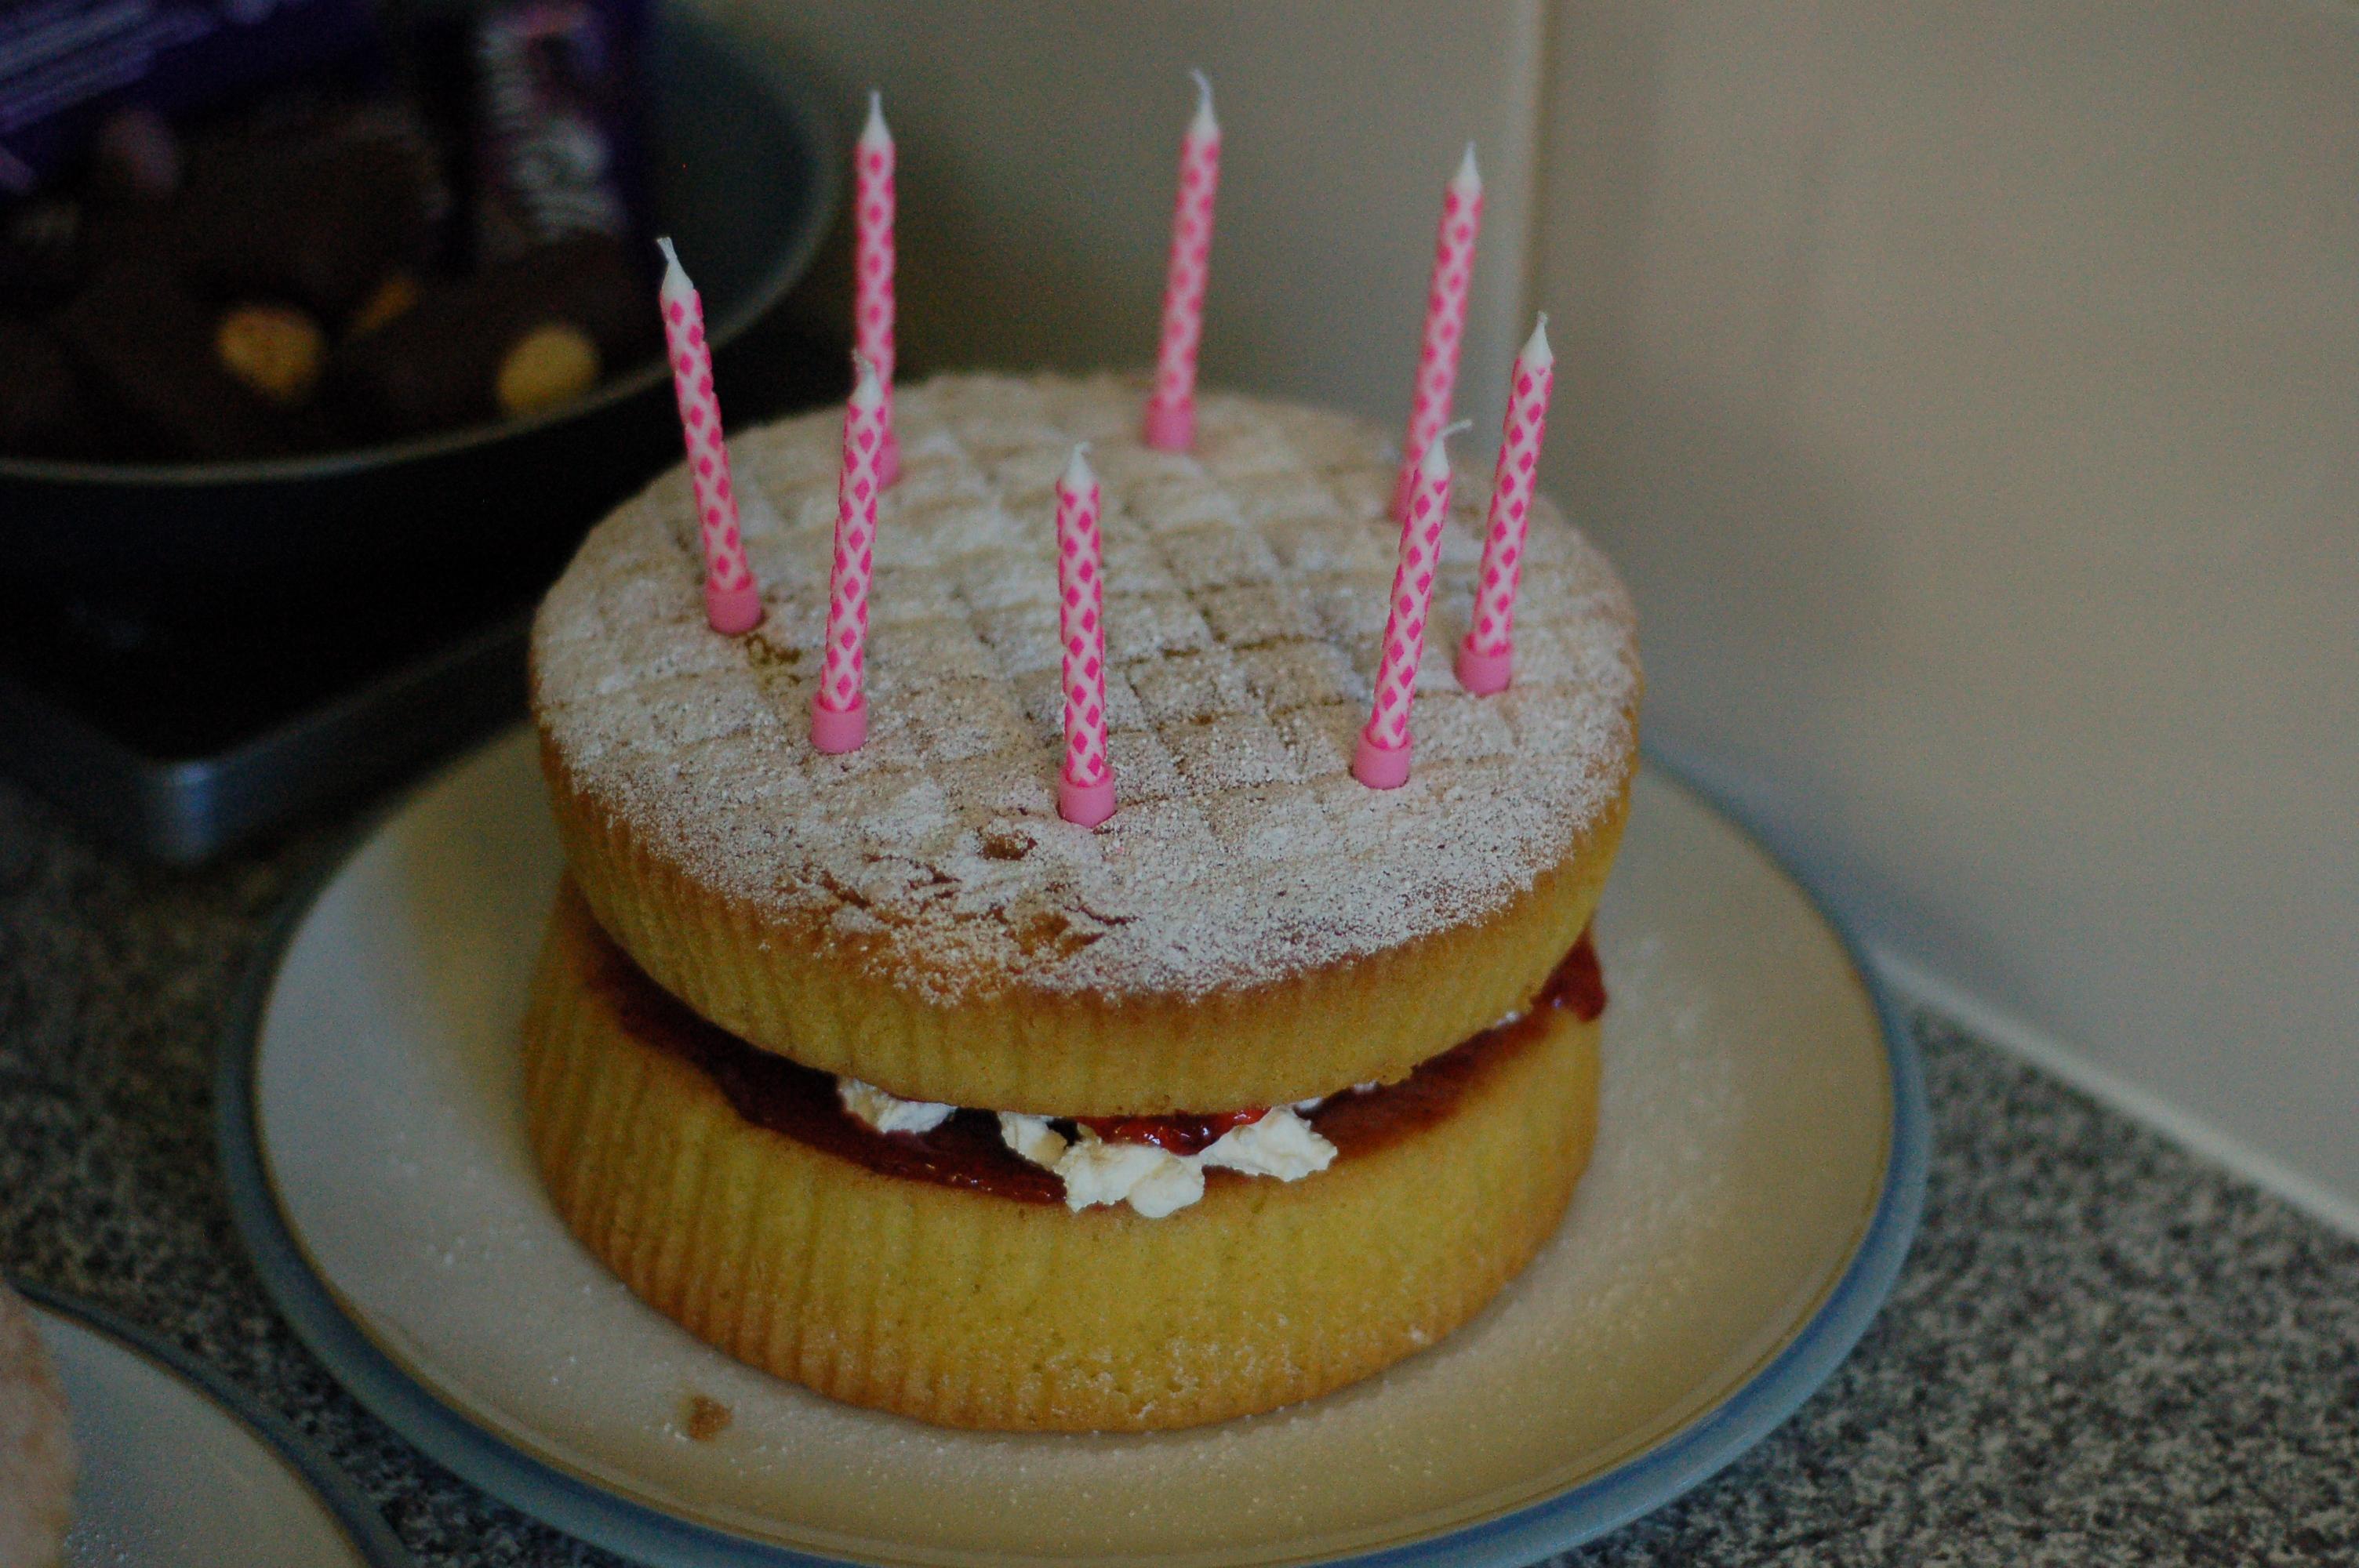 Pleasing Sponge Cake Simple English Wikipedia The Free Encyclopedia Personalised Birthday Cards Arneslily Jamesorg